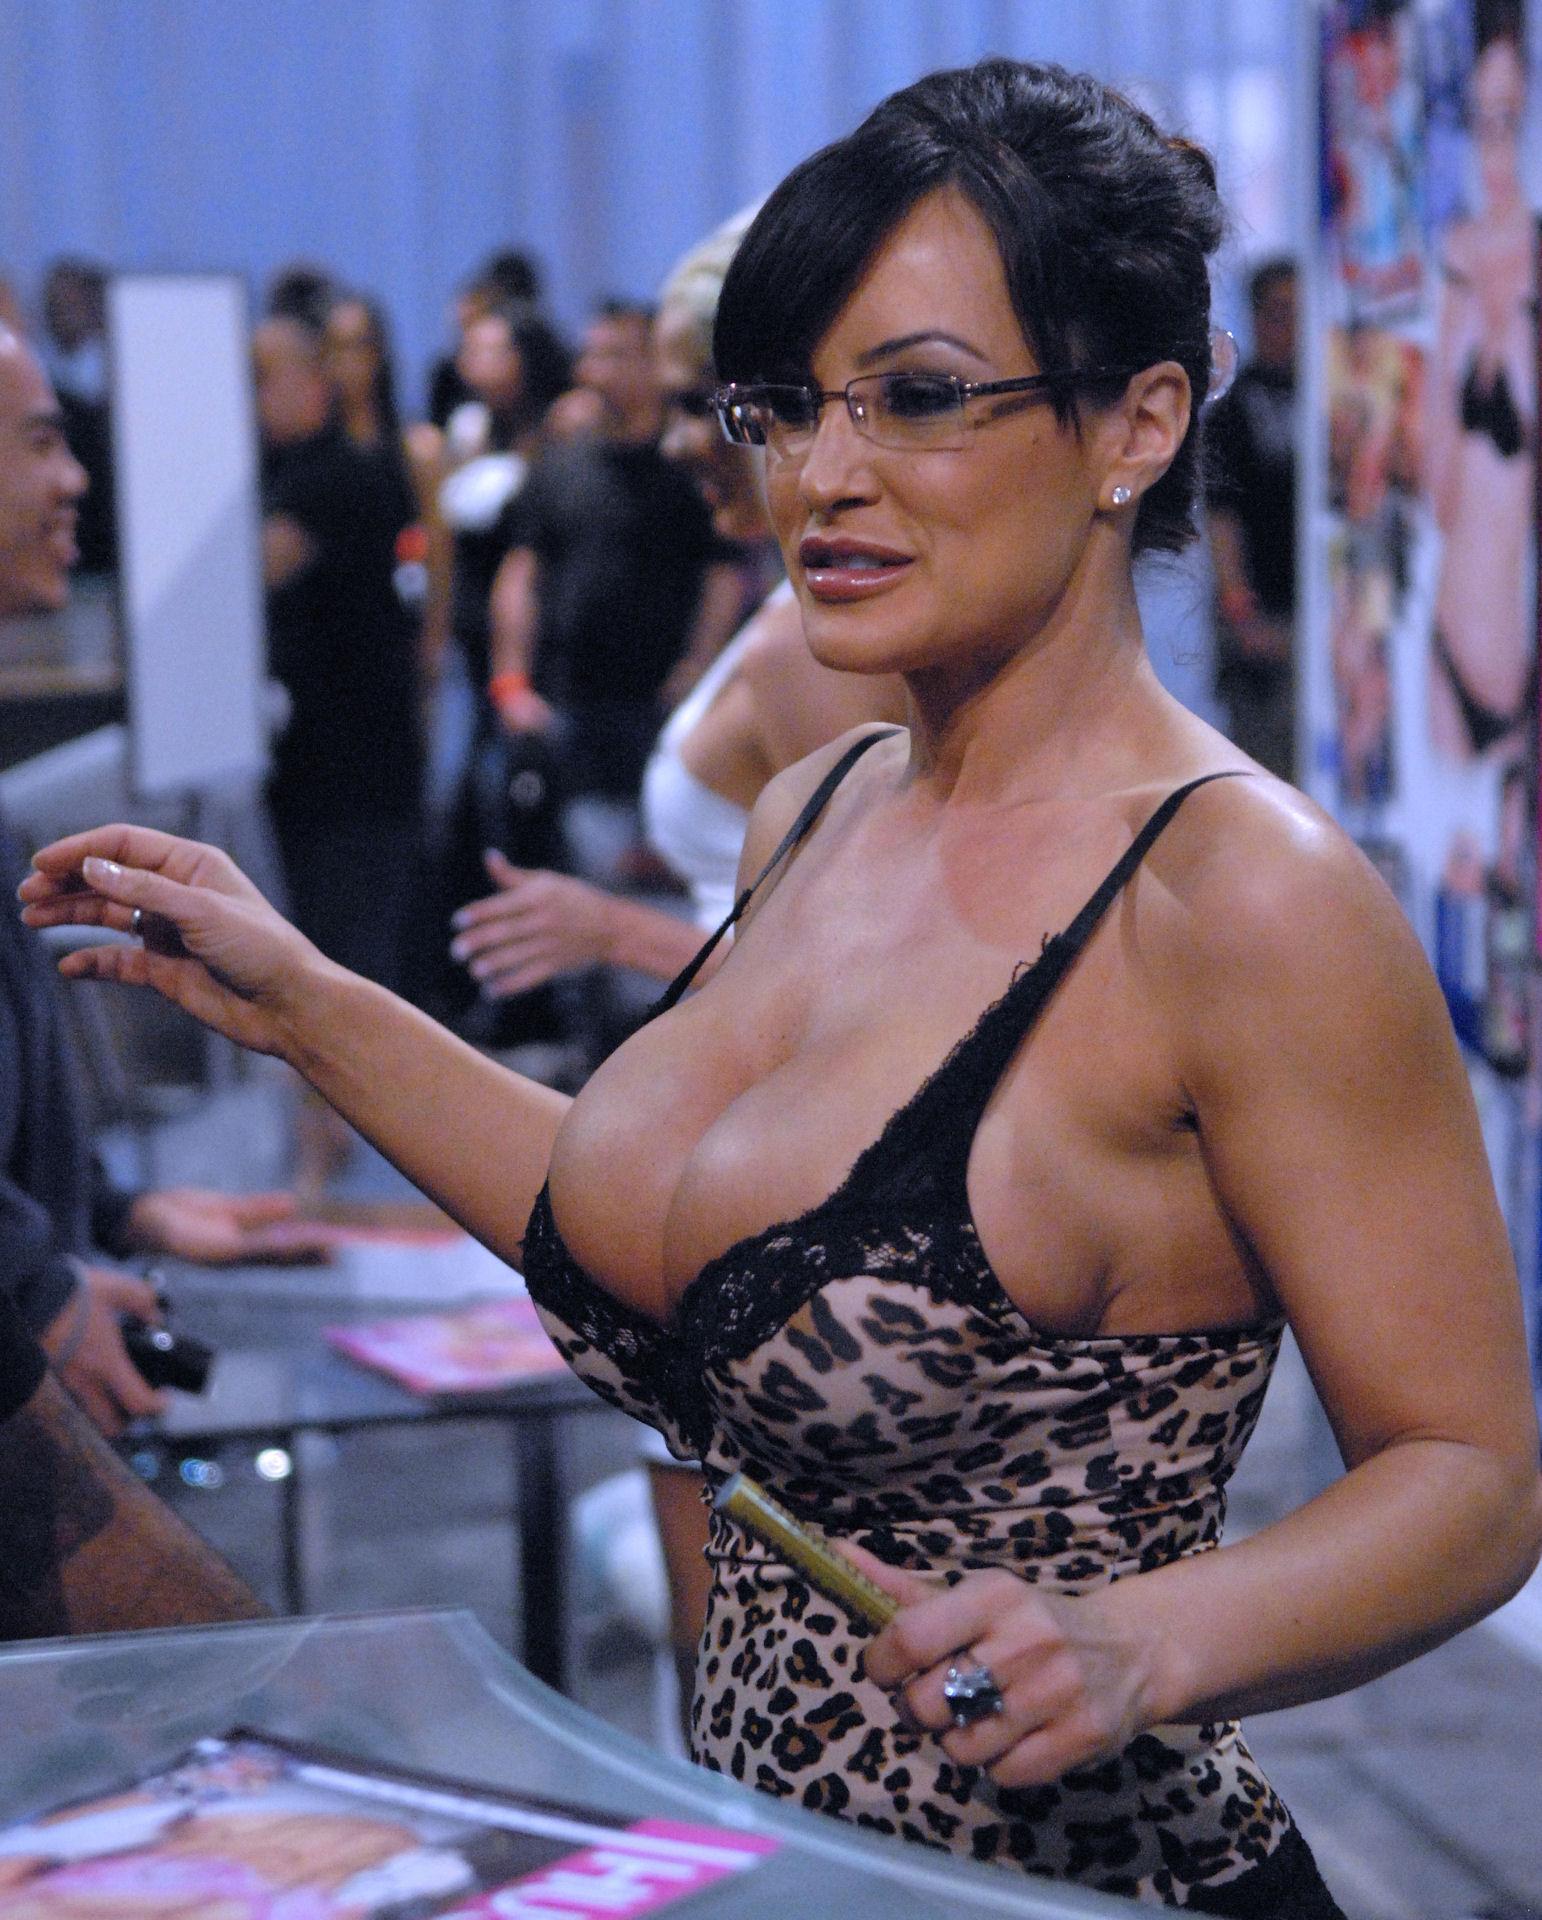 Actriz Porno Lisa Lesbian lisa ann porn pic - eporner